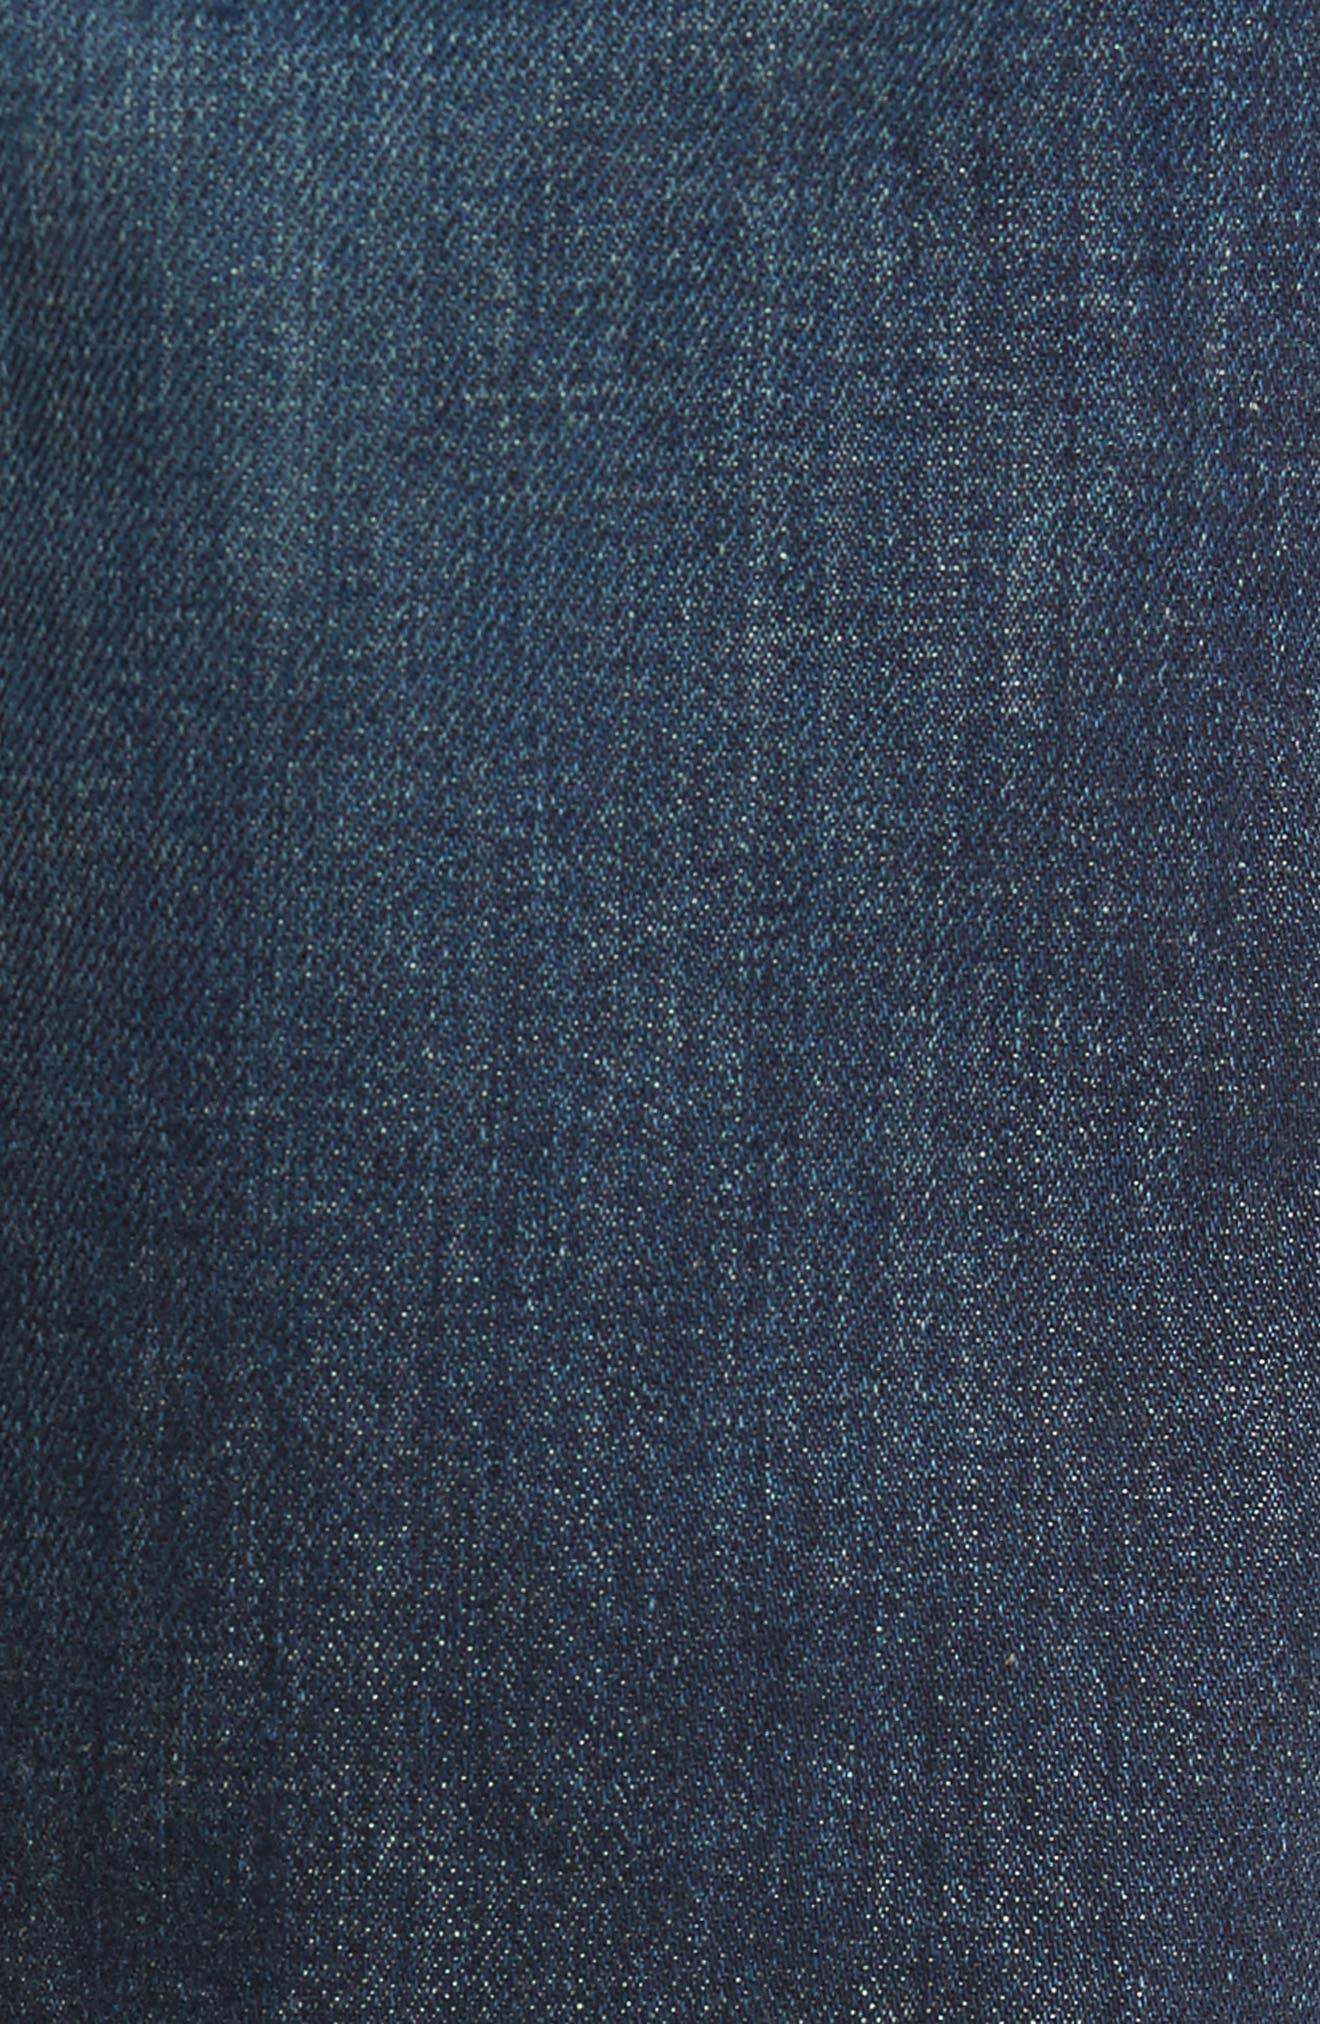 Fit 1 Skinny Fit Jeans,                             Alternate thumbnail 6, color,                             Linden